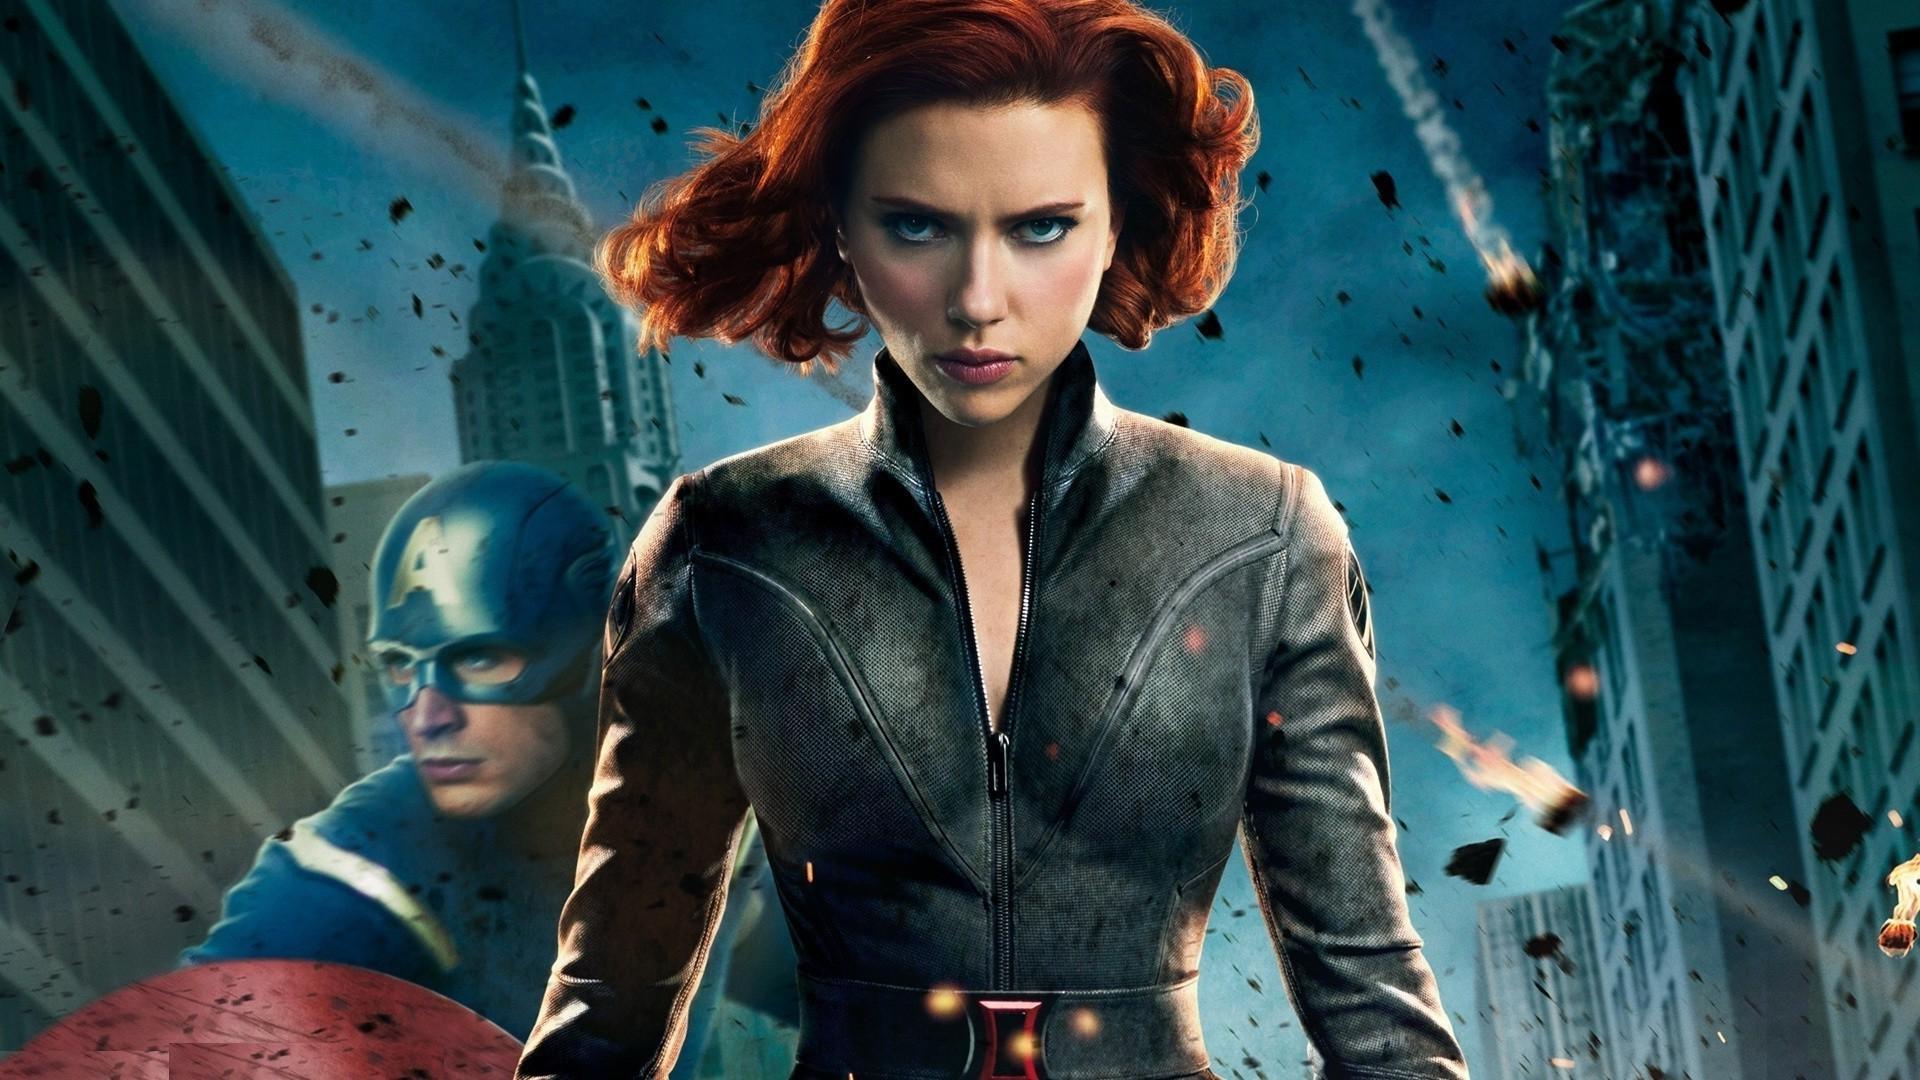 Wallpaper 1920x1080 Px Black Widow Captain America Chris